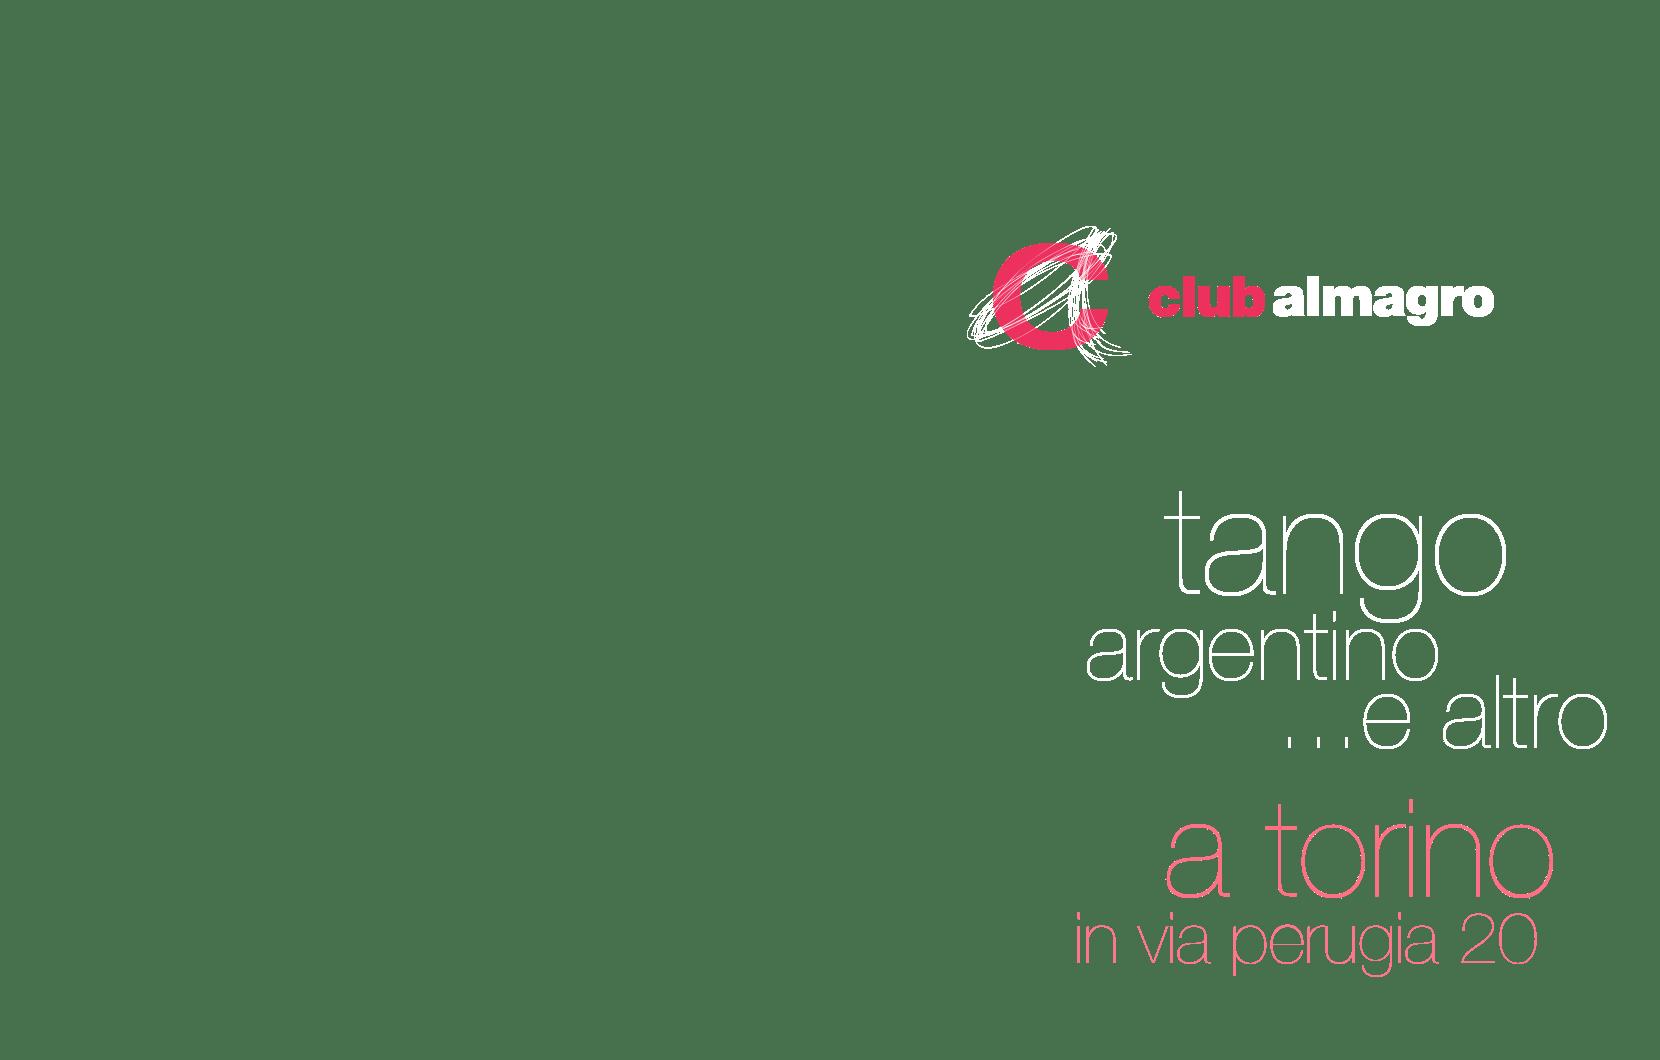 Club-Almagro-Tango-Argentino